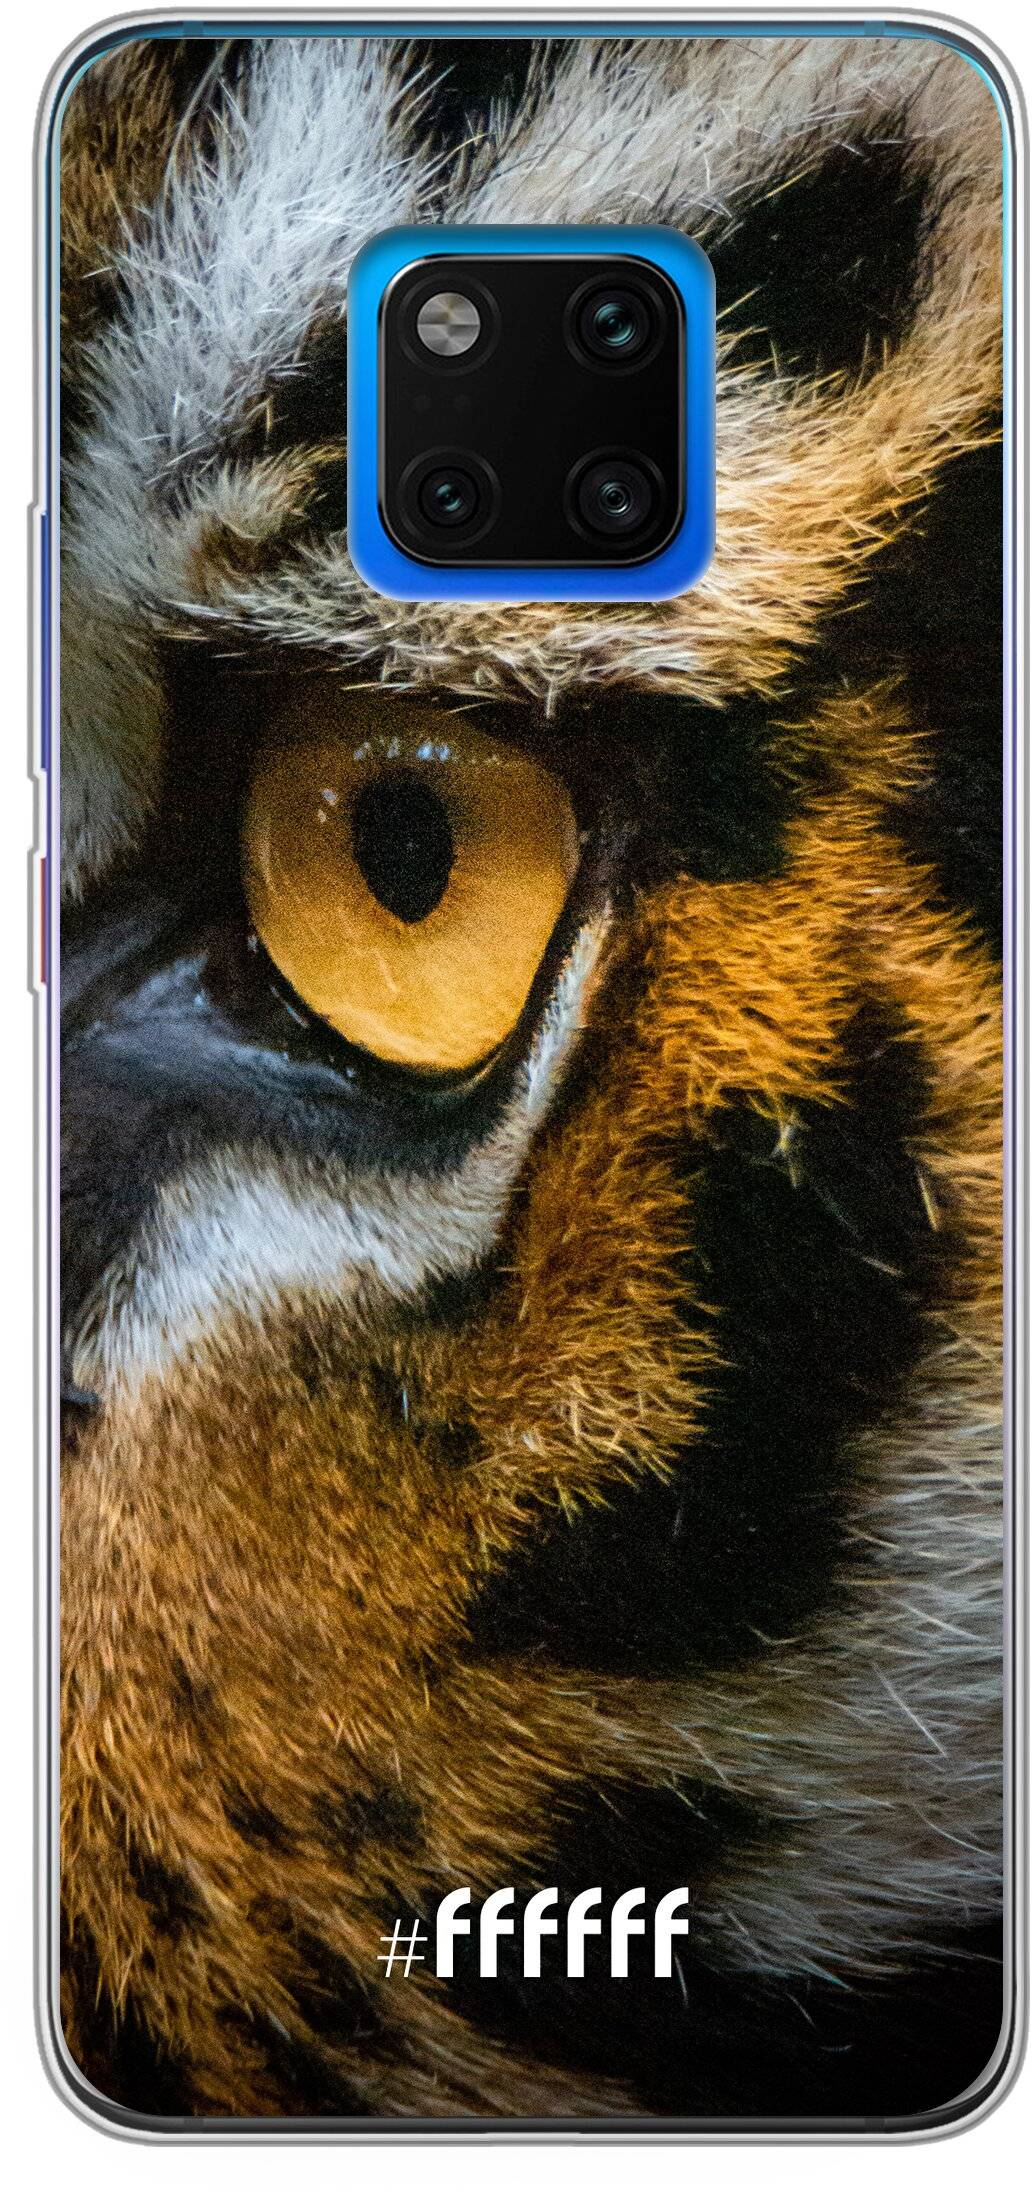 Tiger Mate 20 Pro